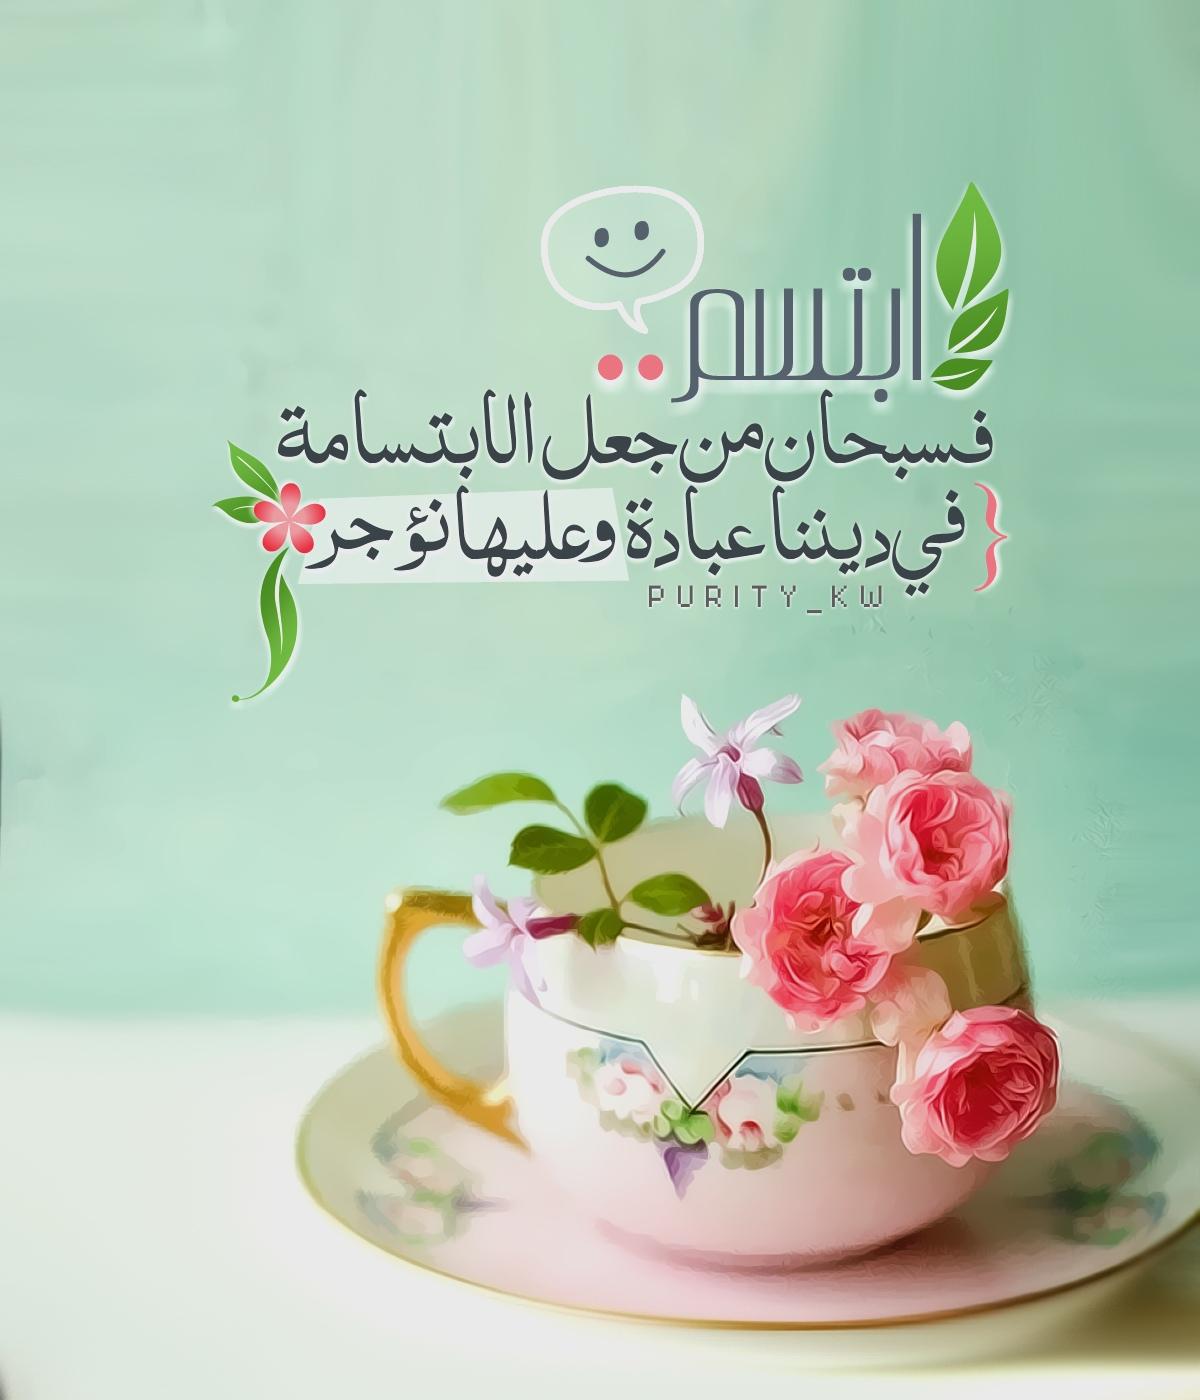 ابتسم فسبحآن من جعـ ـل آلآبتسآمة في د ي ن ن آ عـ ـبآد ة وعـ ـلي هآ ن ؤجر صباح الابتسامه Coffee Cup Art Beautiful Islamic Quotes Bubbles Wallpaper